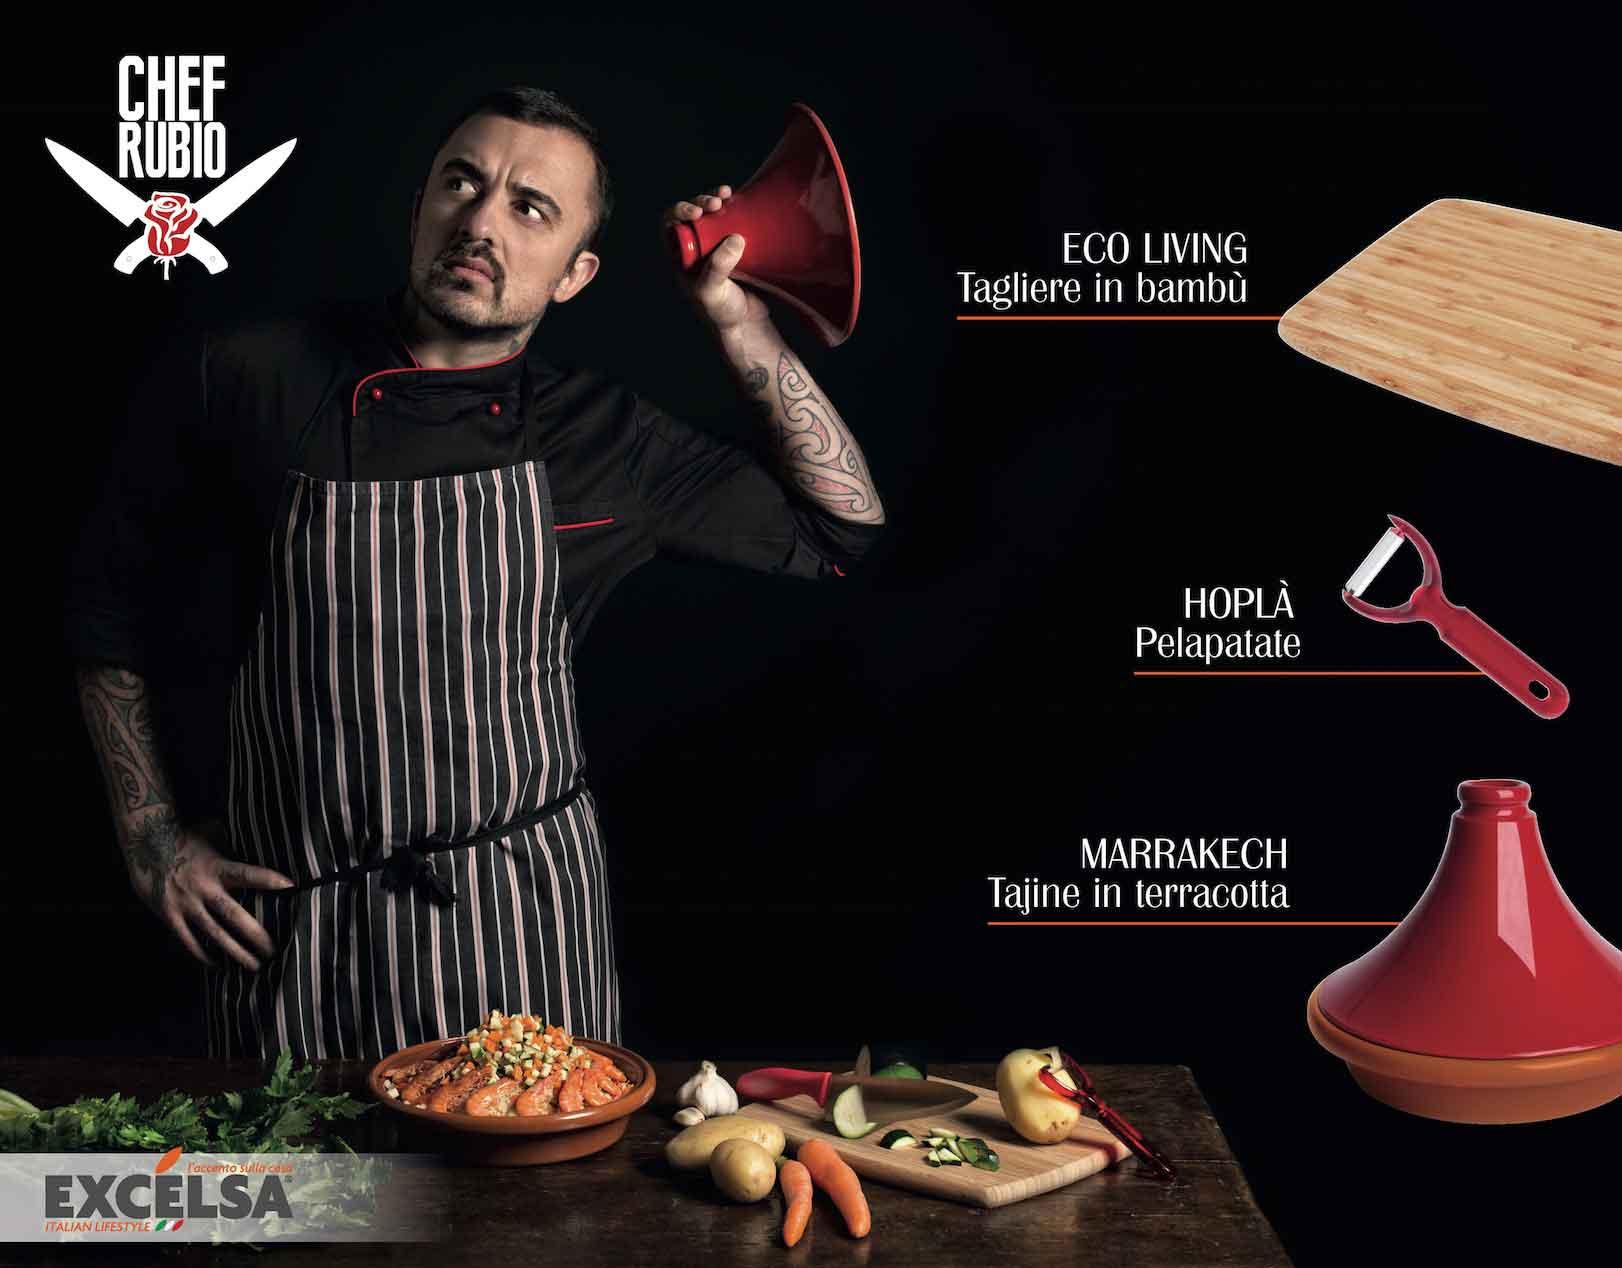 calendario Rubio chef gennaio